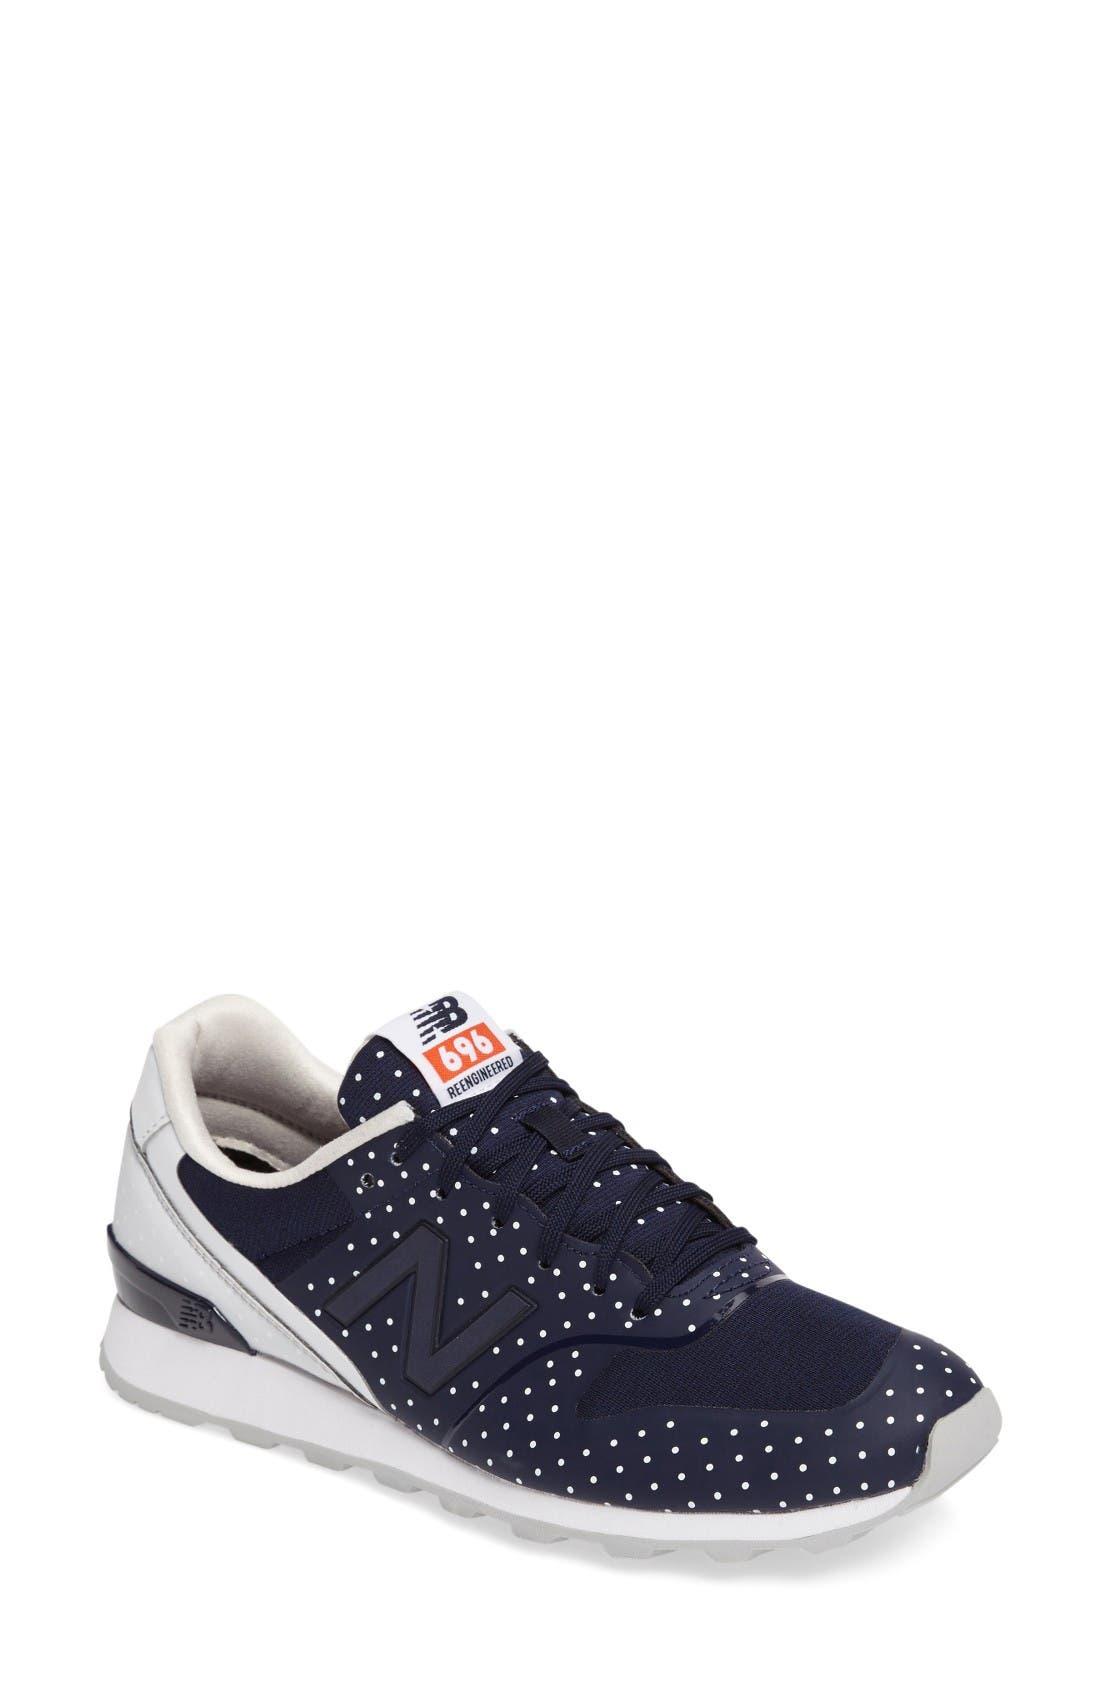 Main Image - New Balance 696 Sneaker (Women)